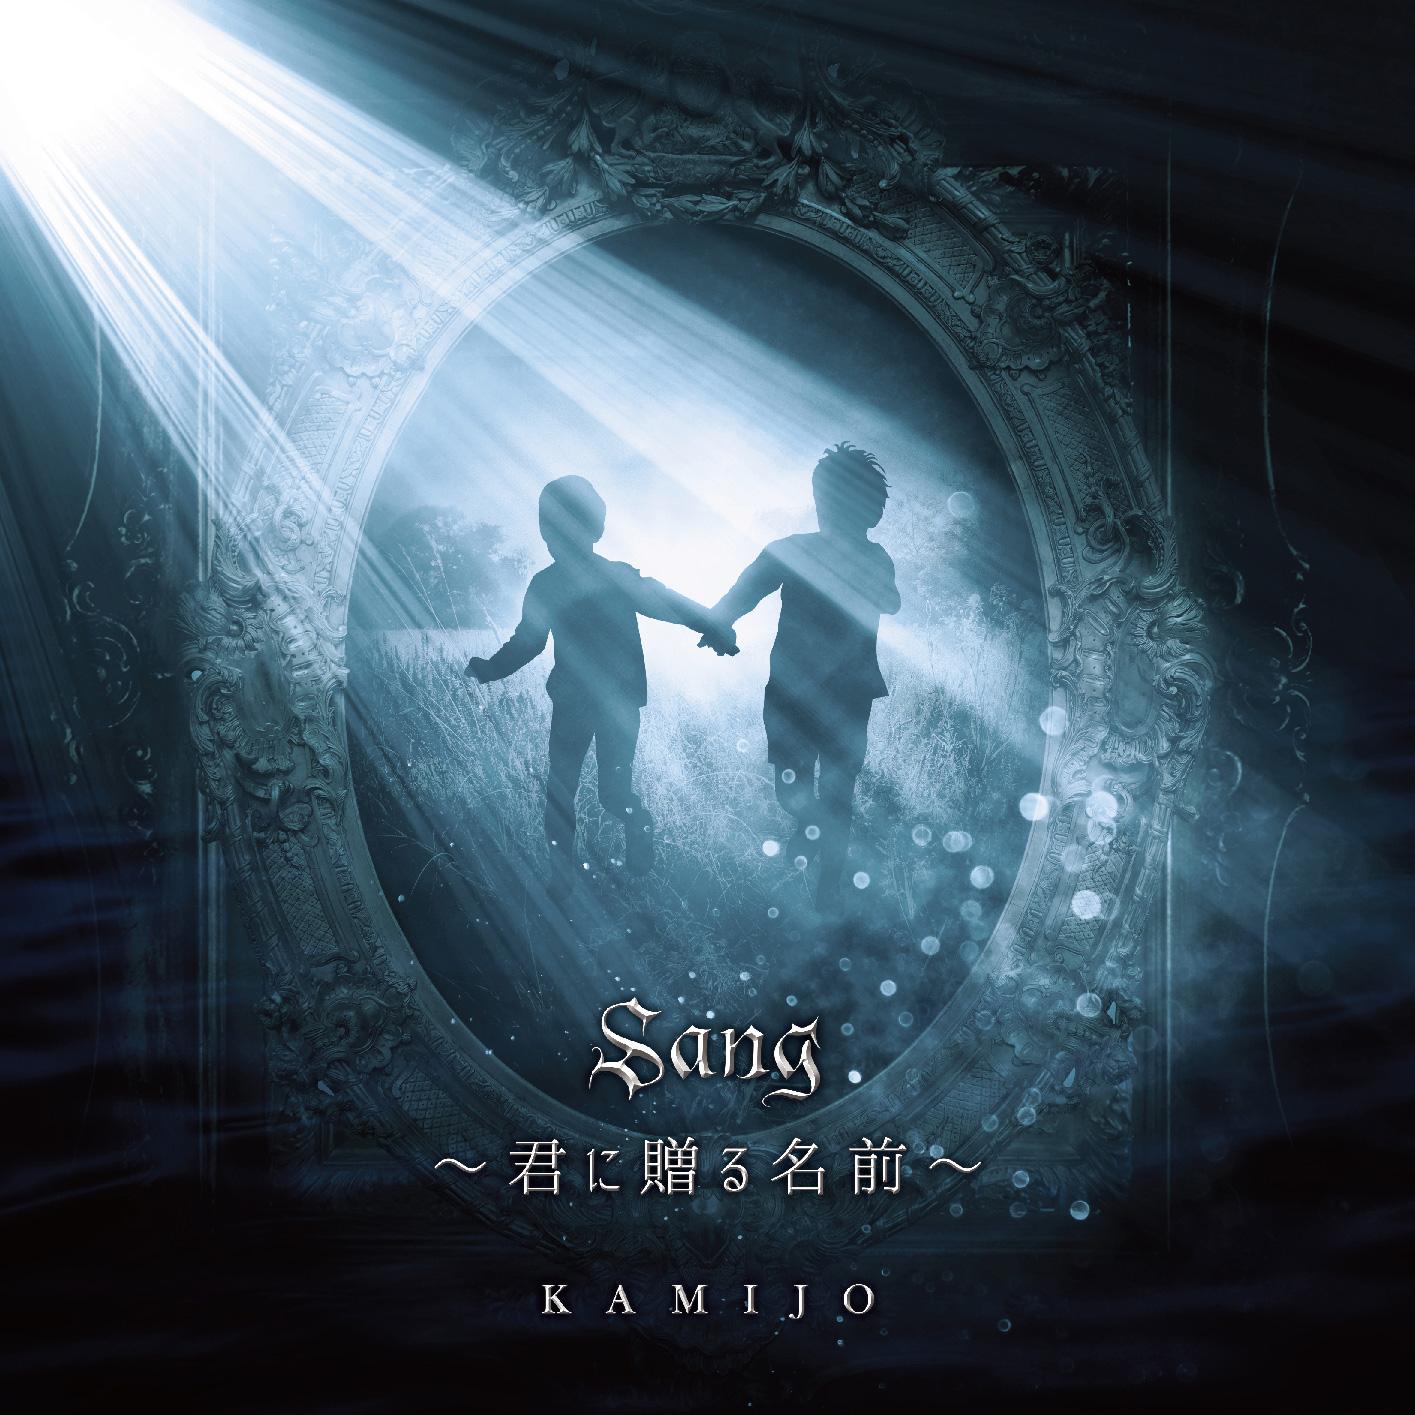 KAMIJO – Sang 〜君に贈る名前〜 [FLAC + MP3 320 / CD] [2018.07.18]